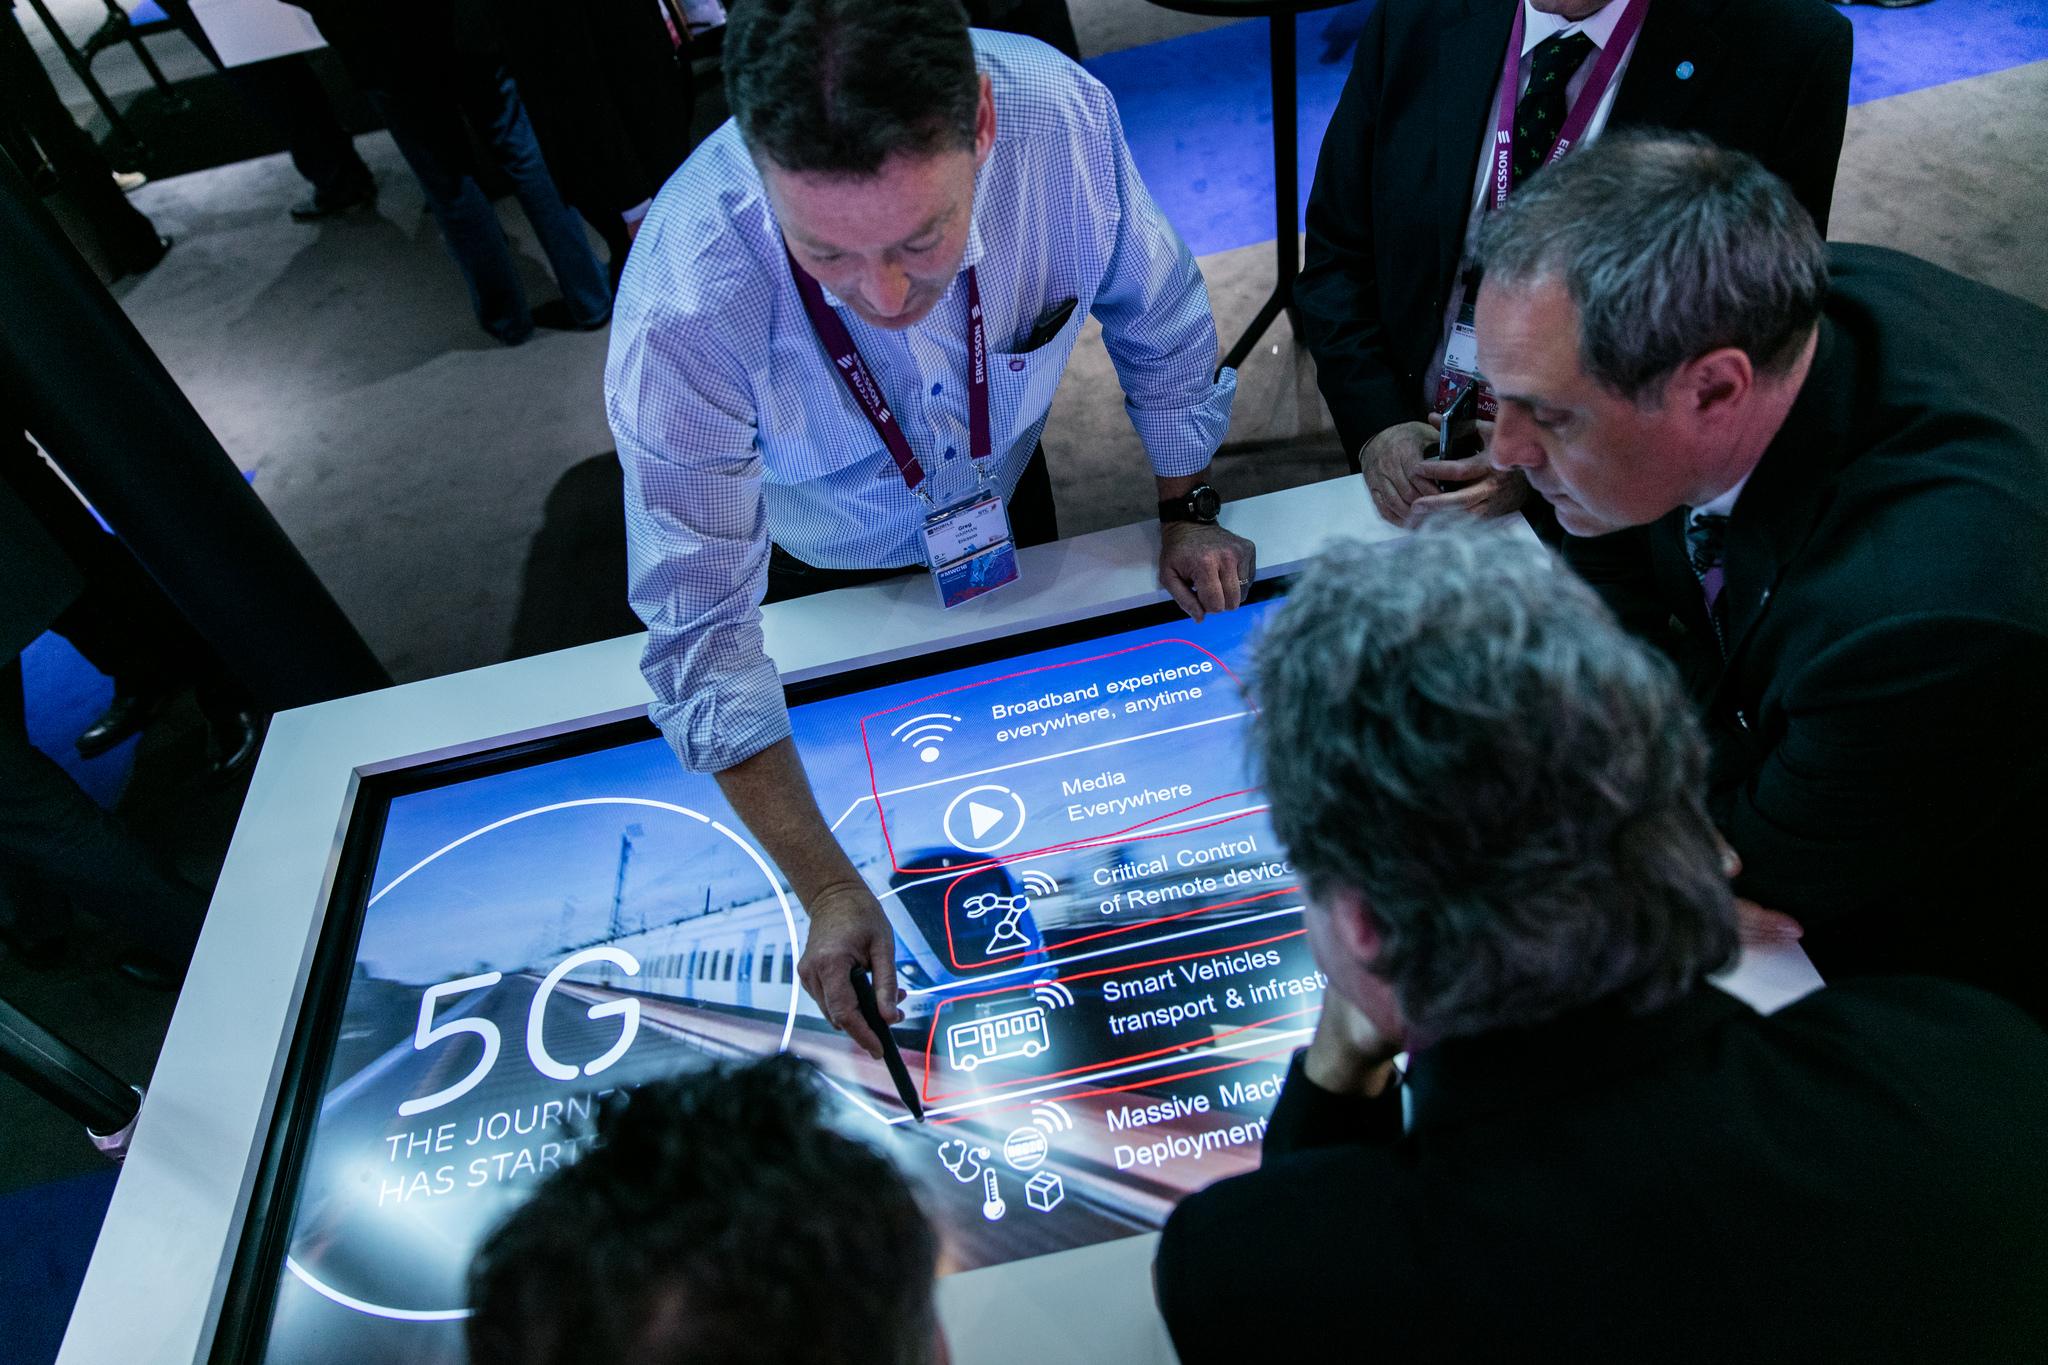 Mobile World Congress Ericsson both